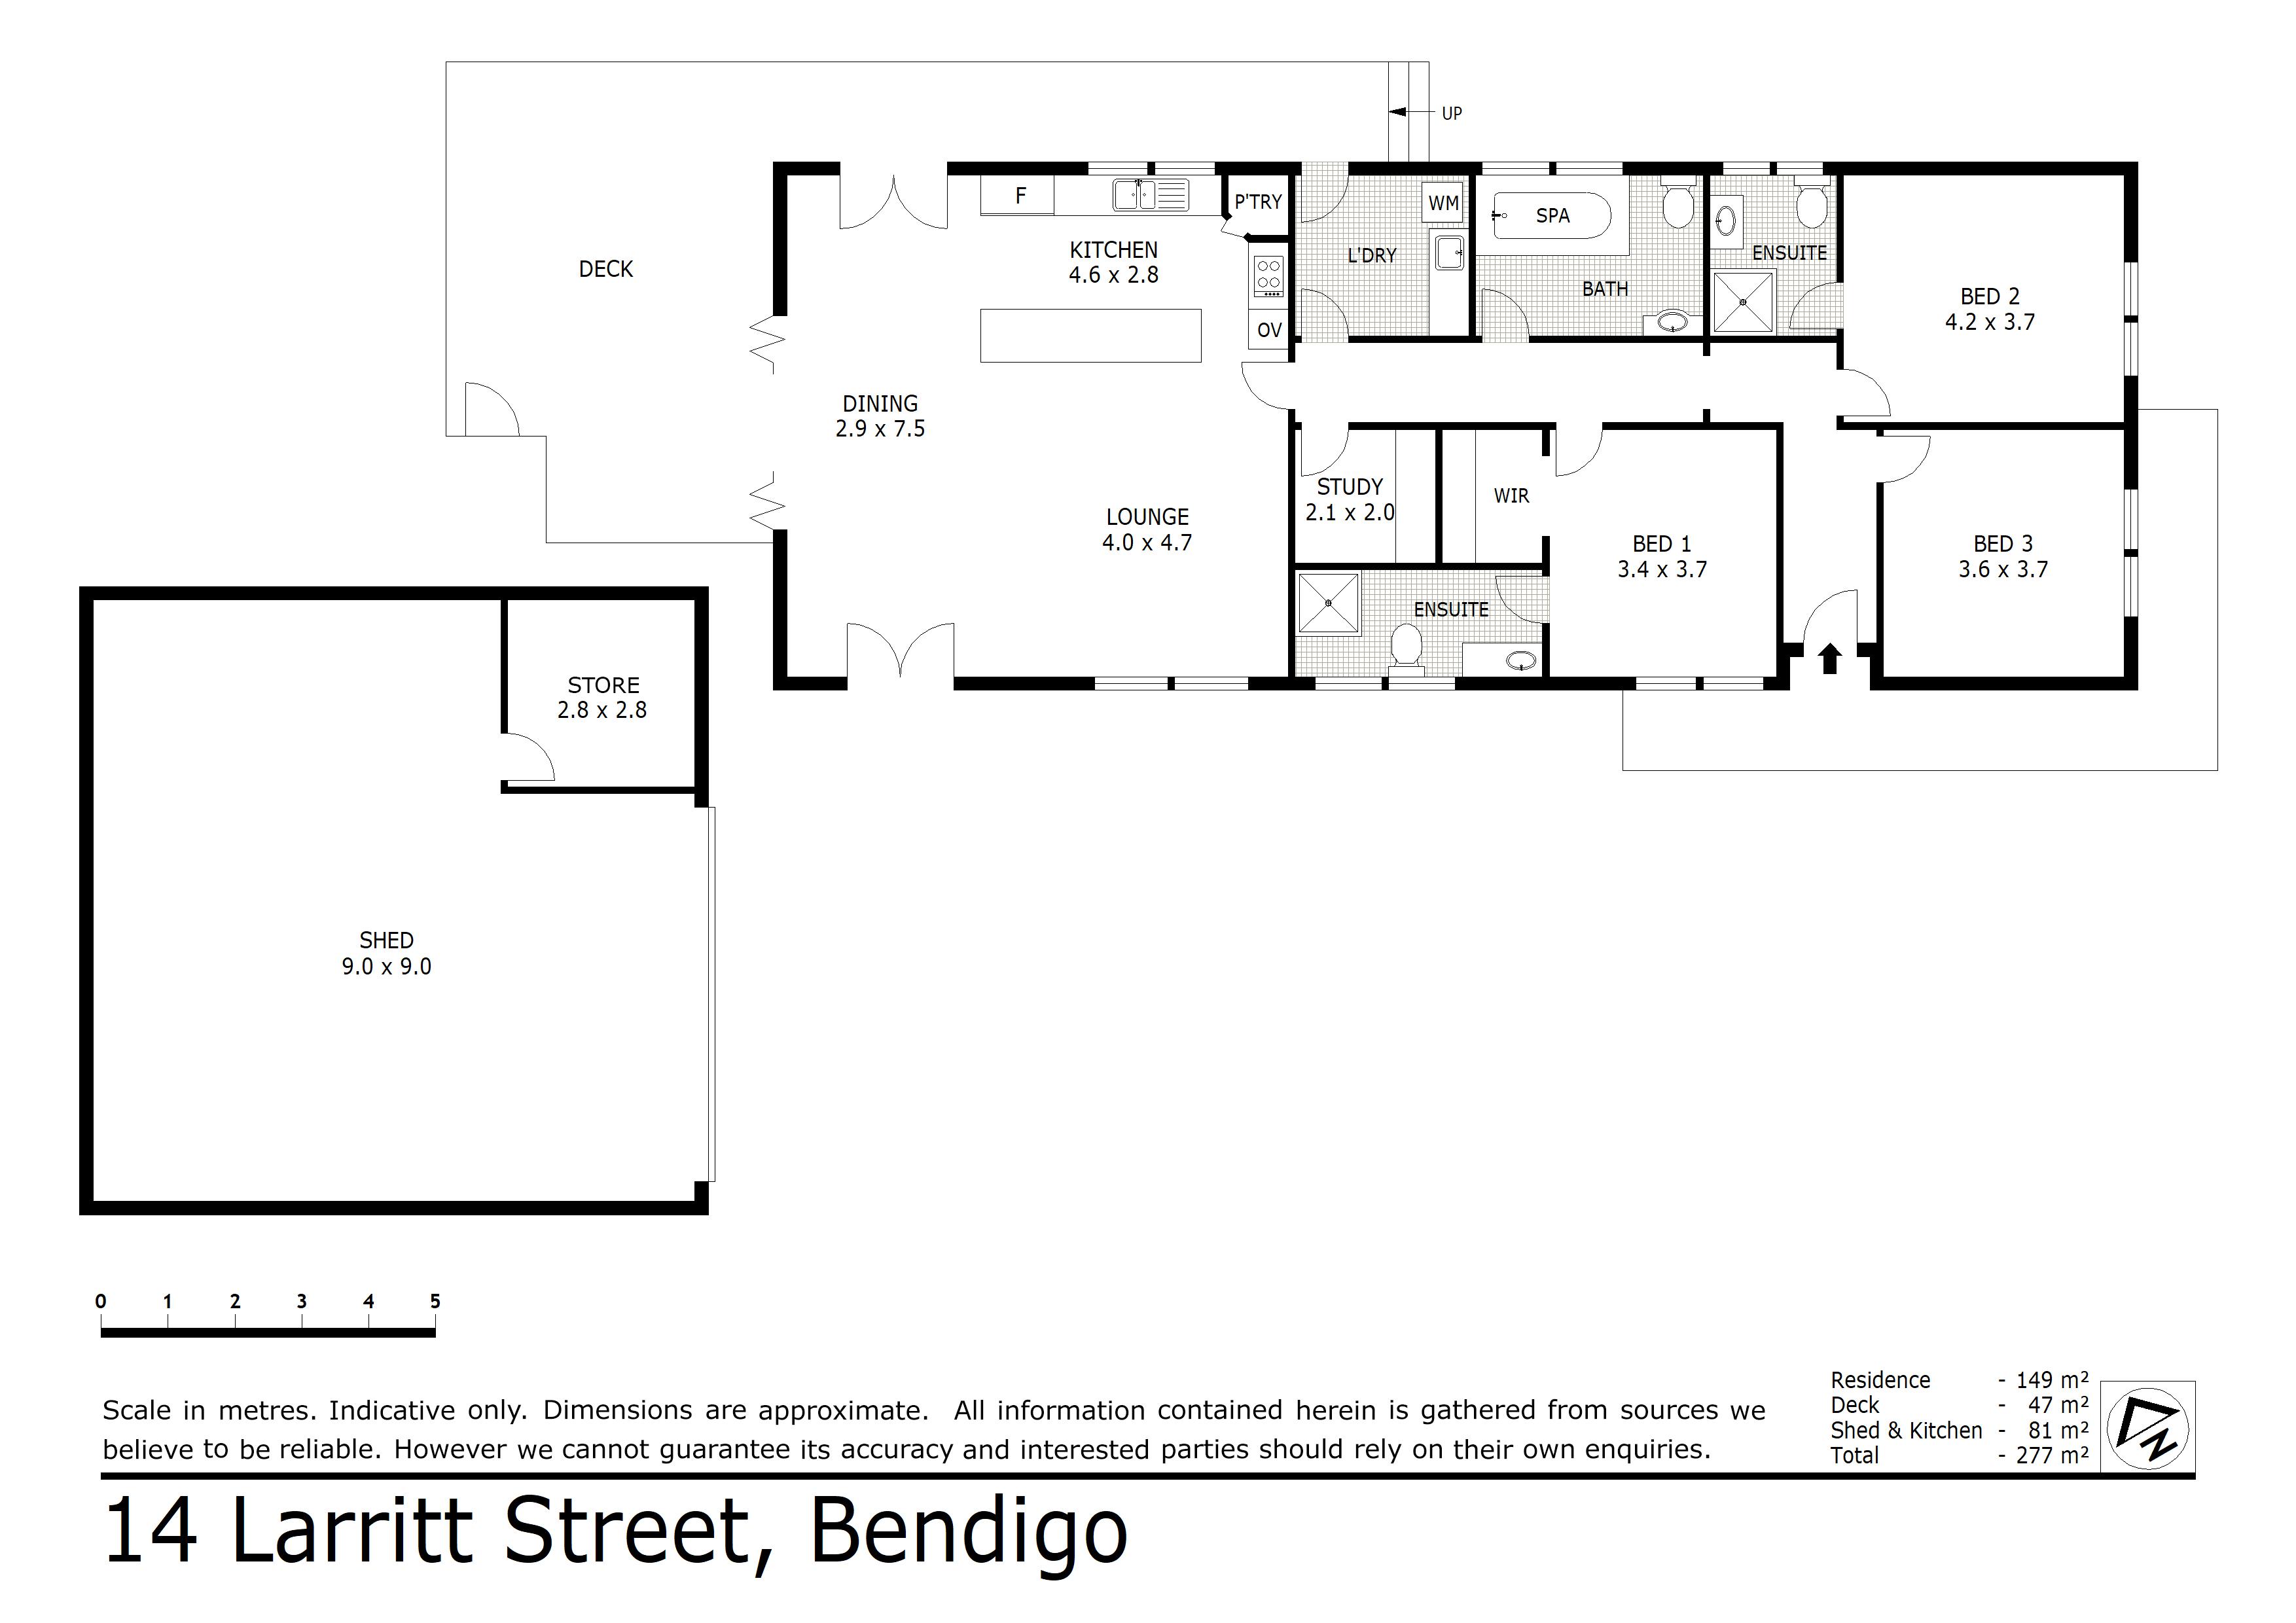 14 Larritt Street, Bendigo, VIC 3550